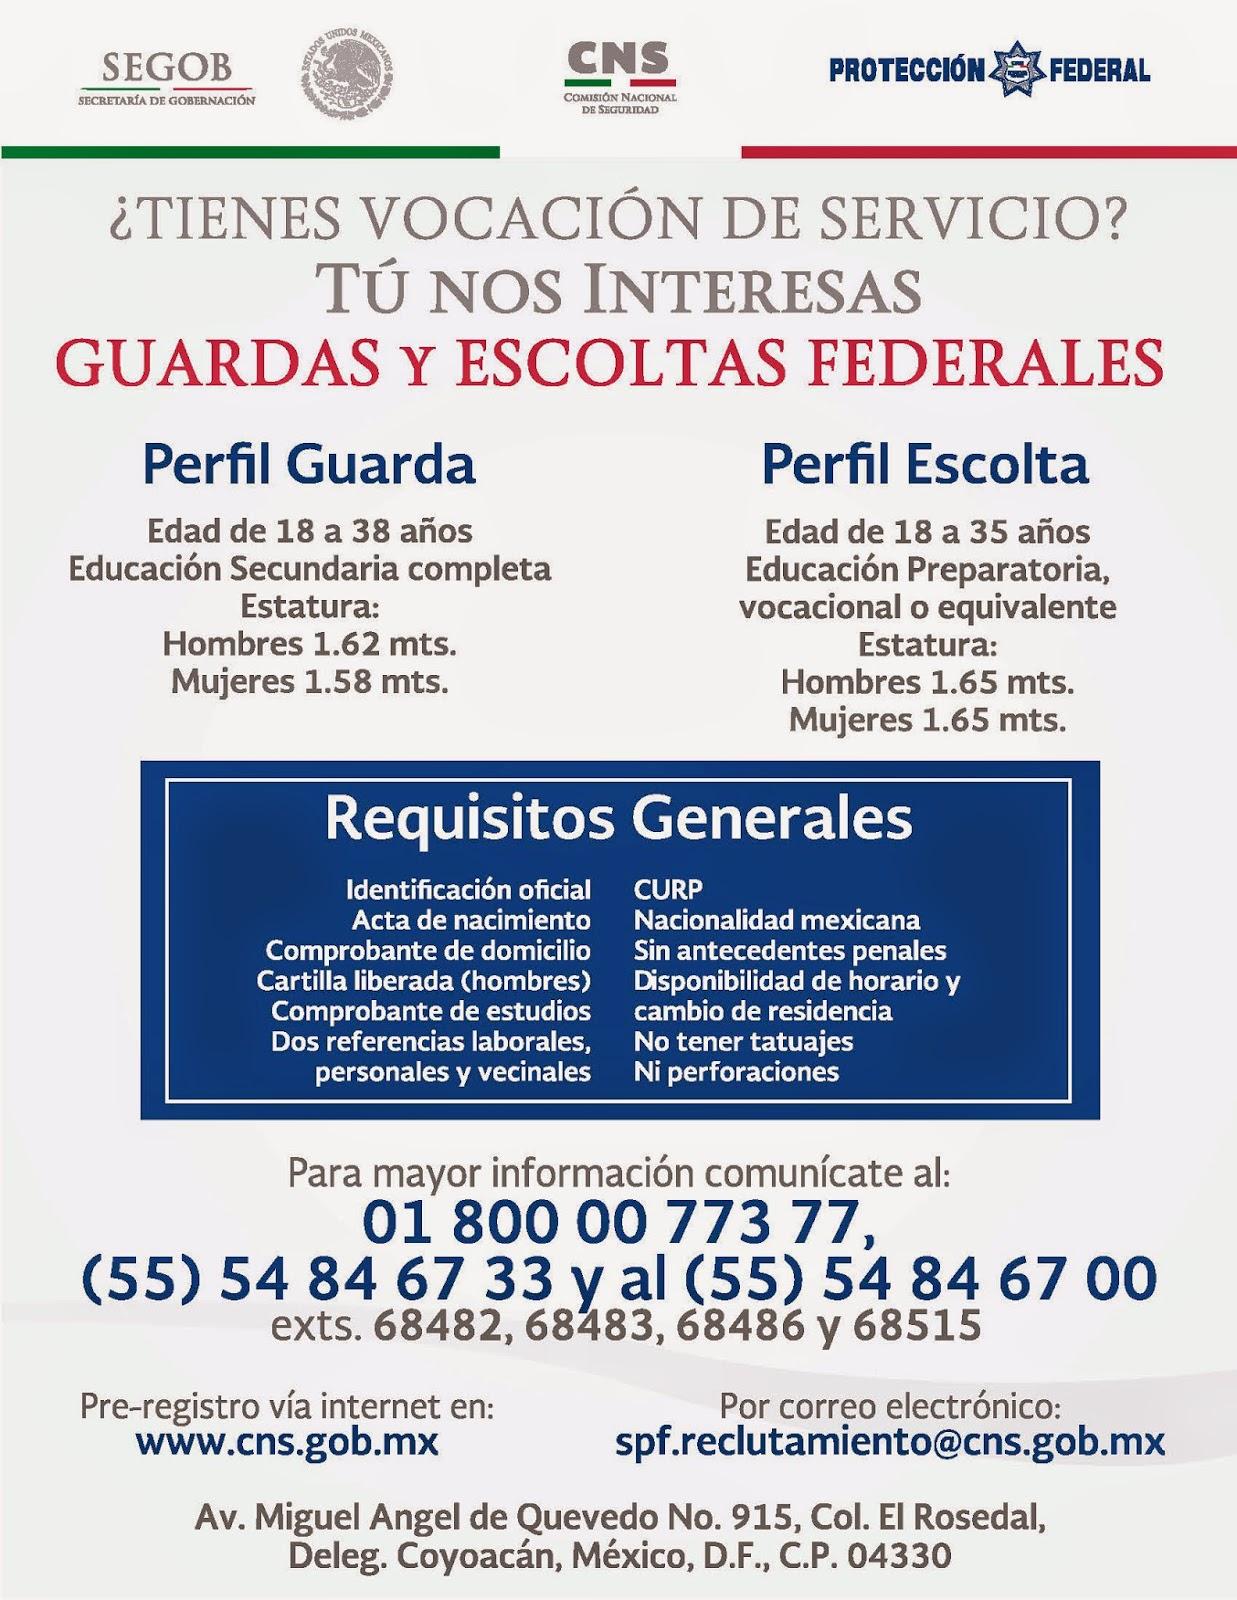 http://sindet-sedatu.org.mx/web/doctos/convocatoria_SPF05_modPATH.pdf